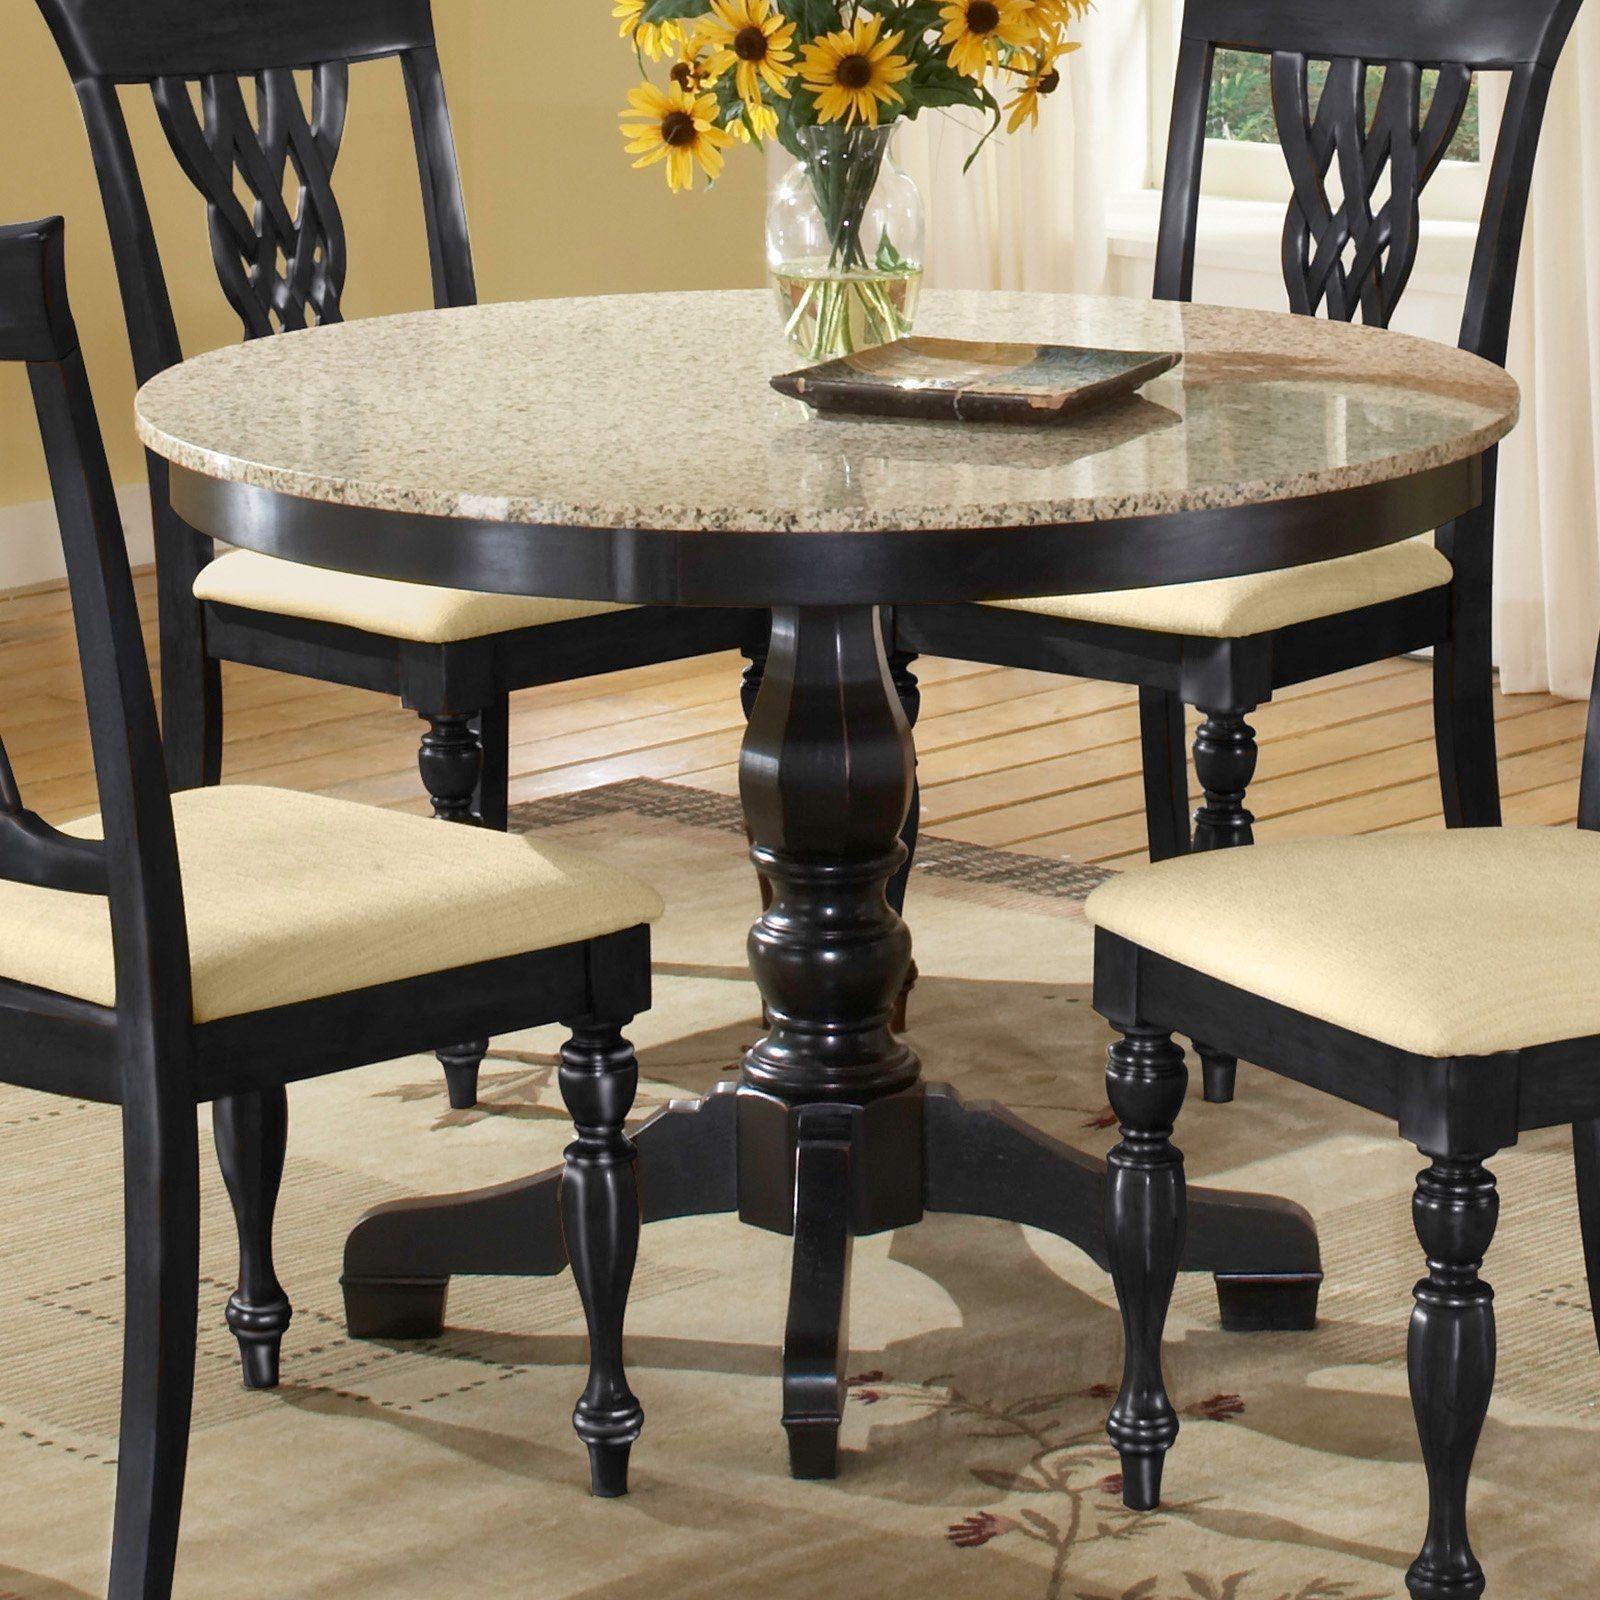 42 Round Granite Table Top